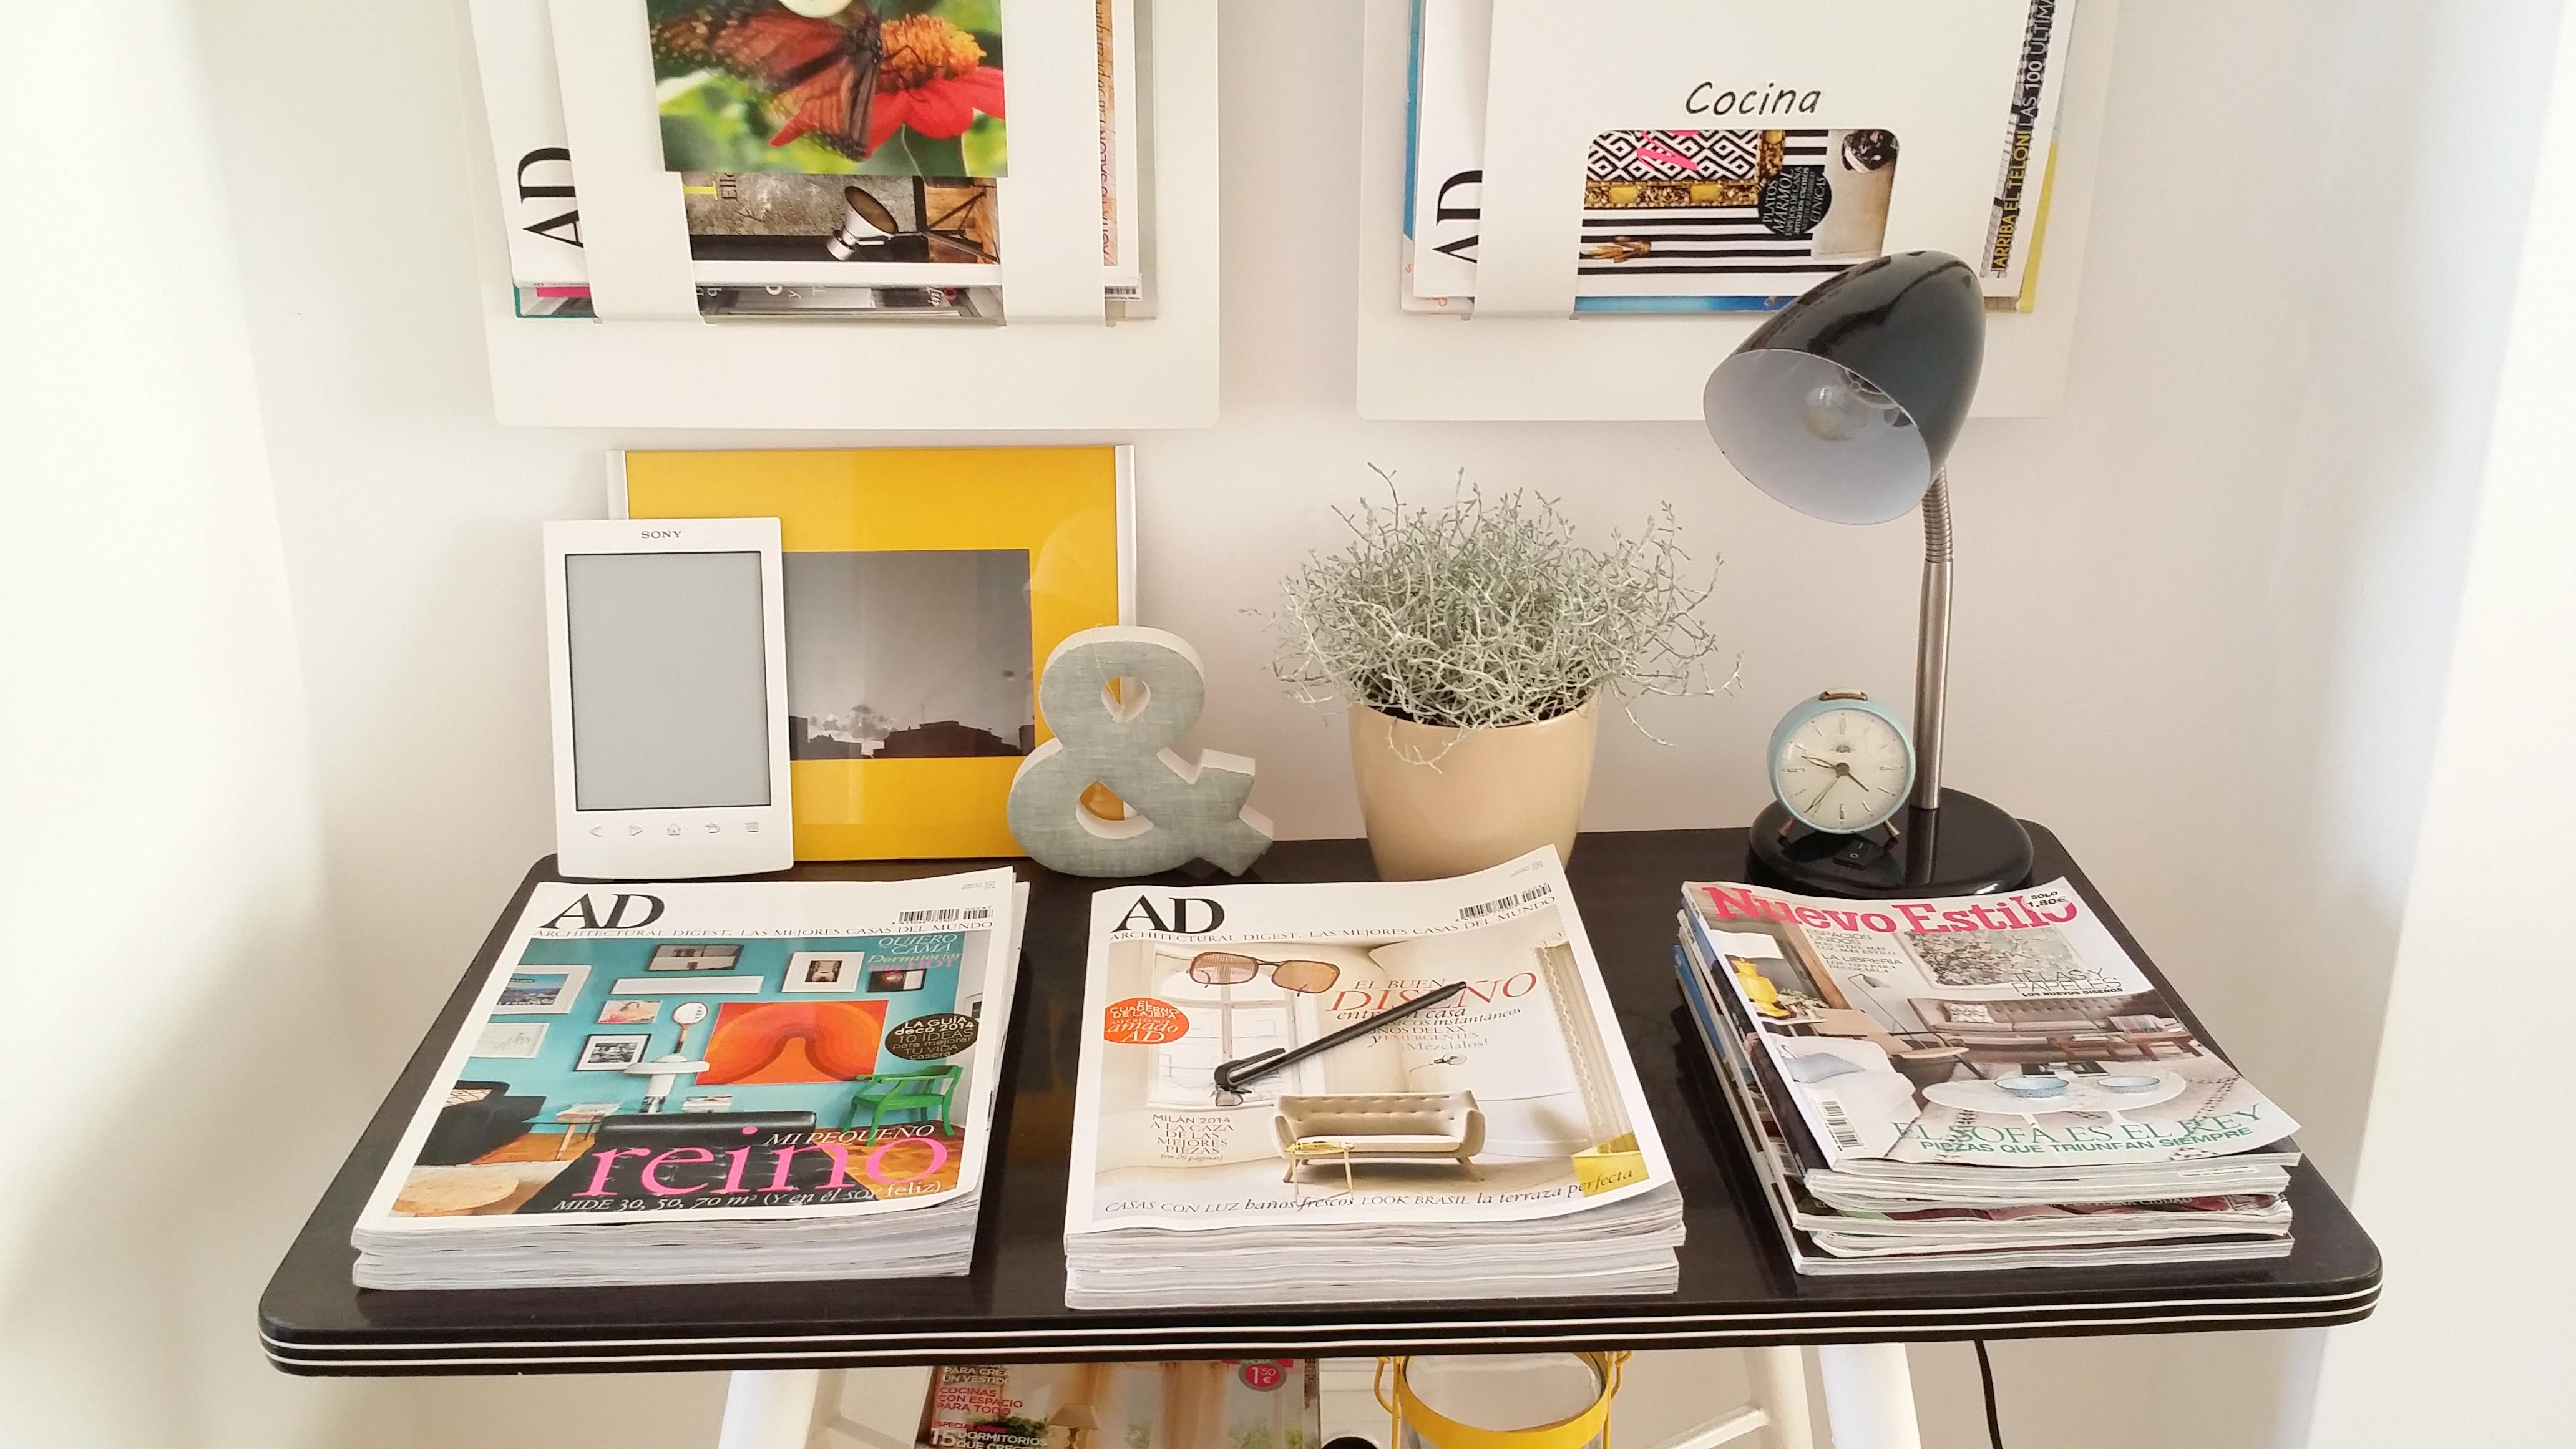 Diy mueble de tele de casi 50 a os convertido en bonito for Mueble camarera cocina